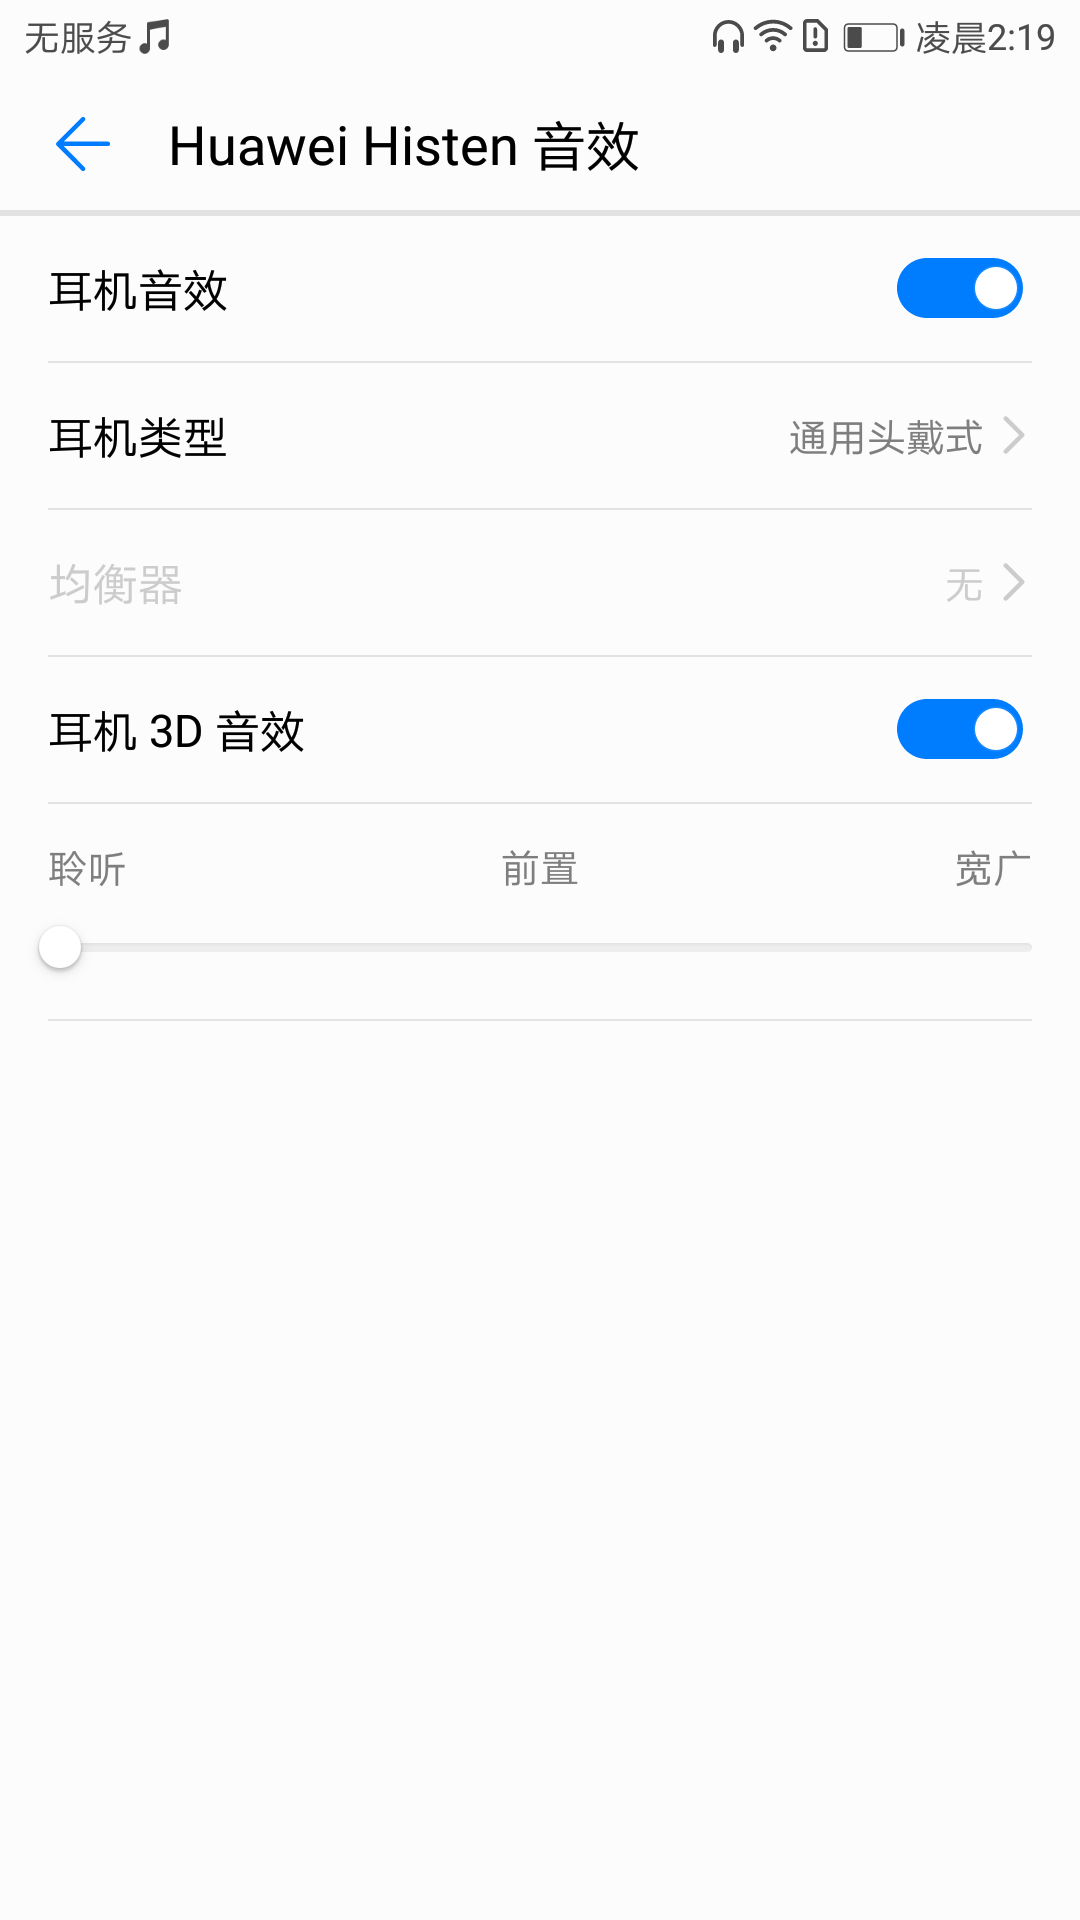 Screenshot_20170613-021953.png